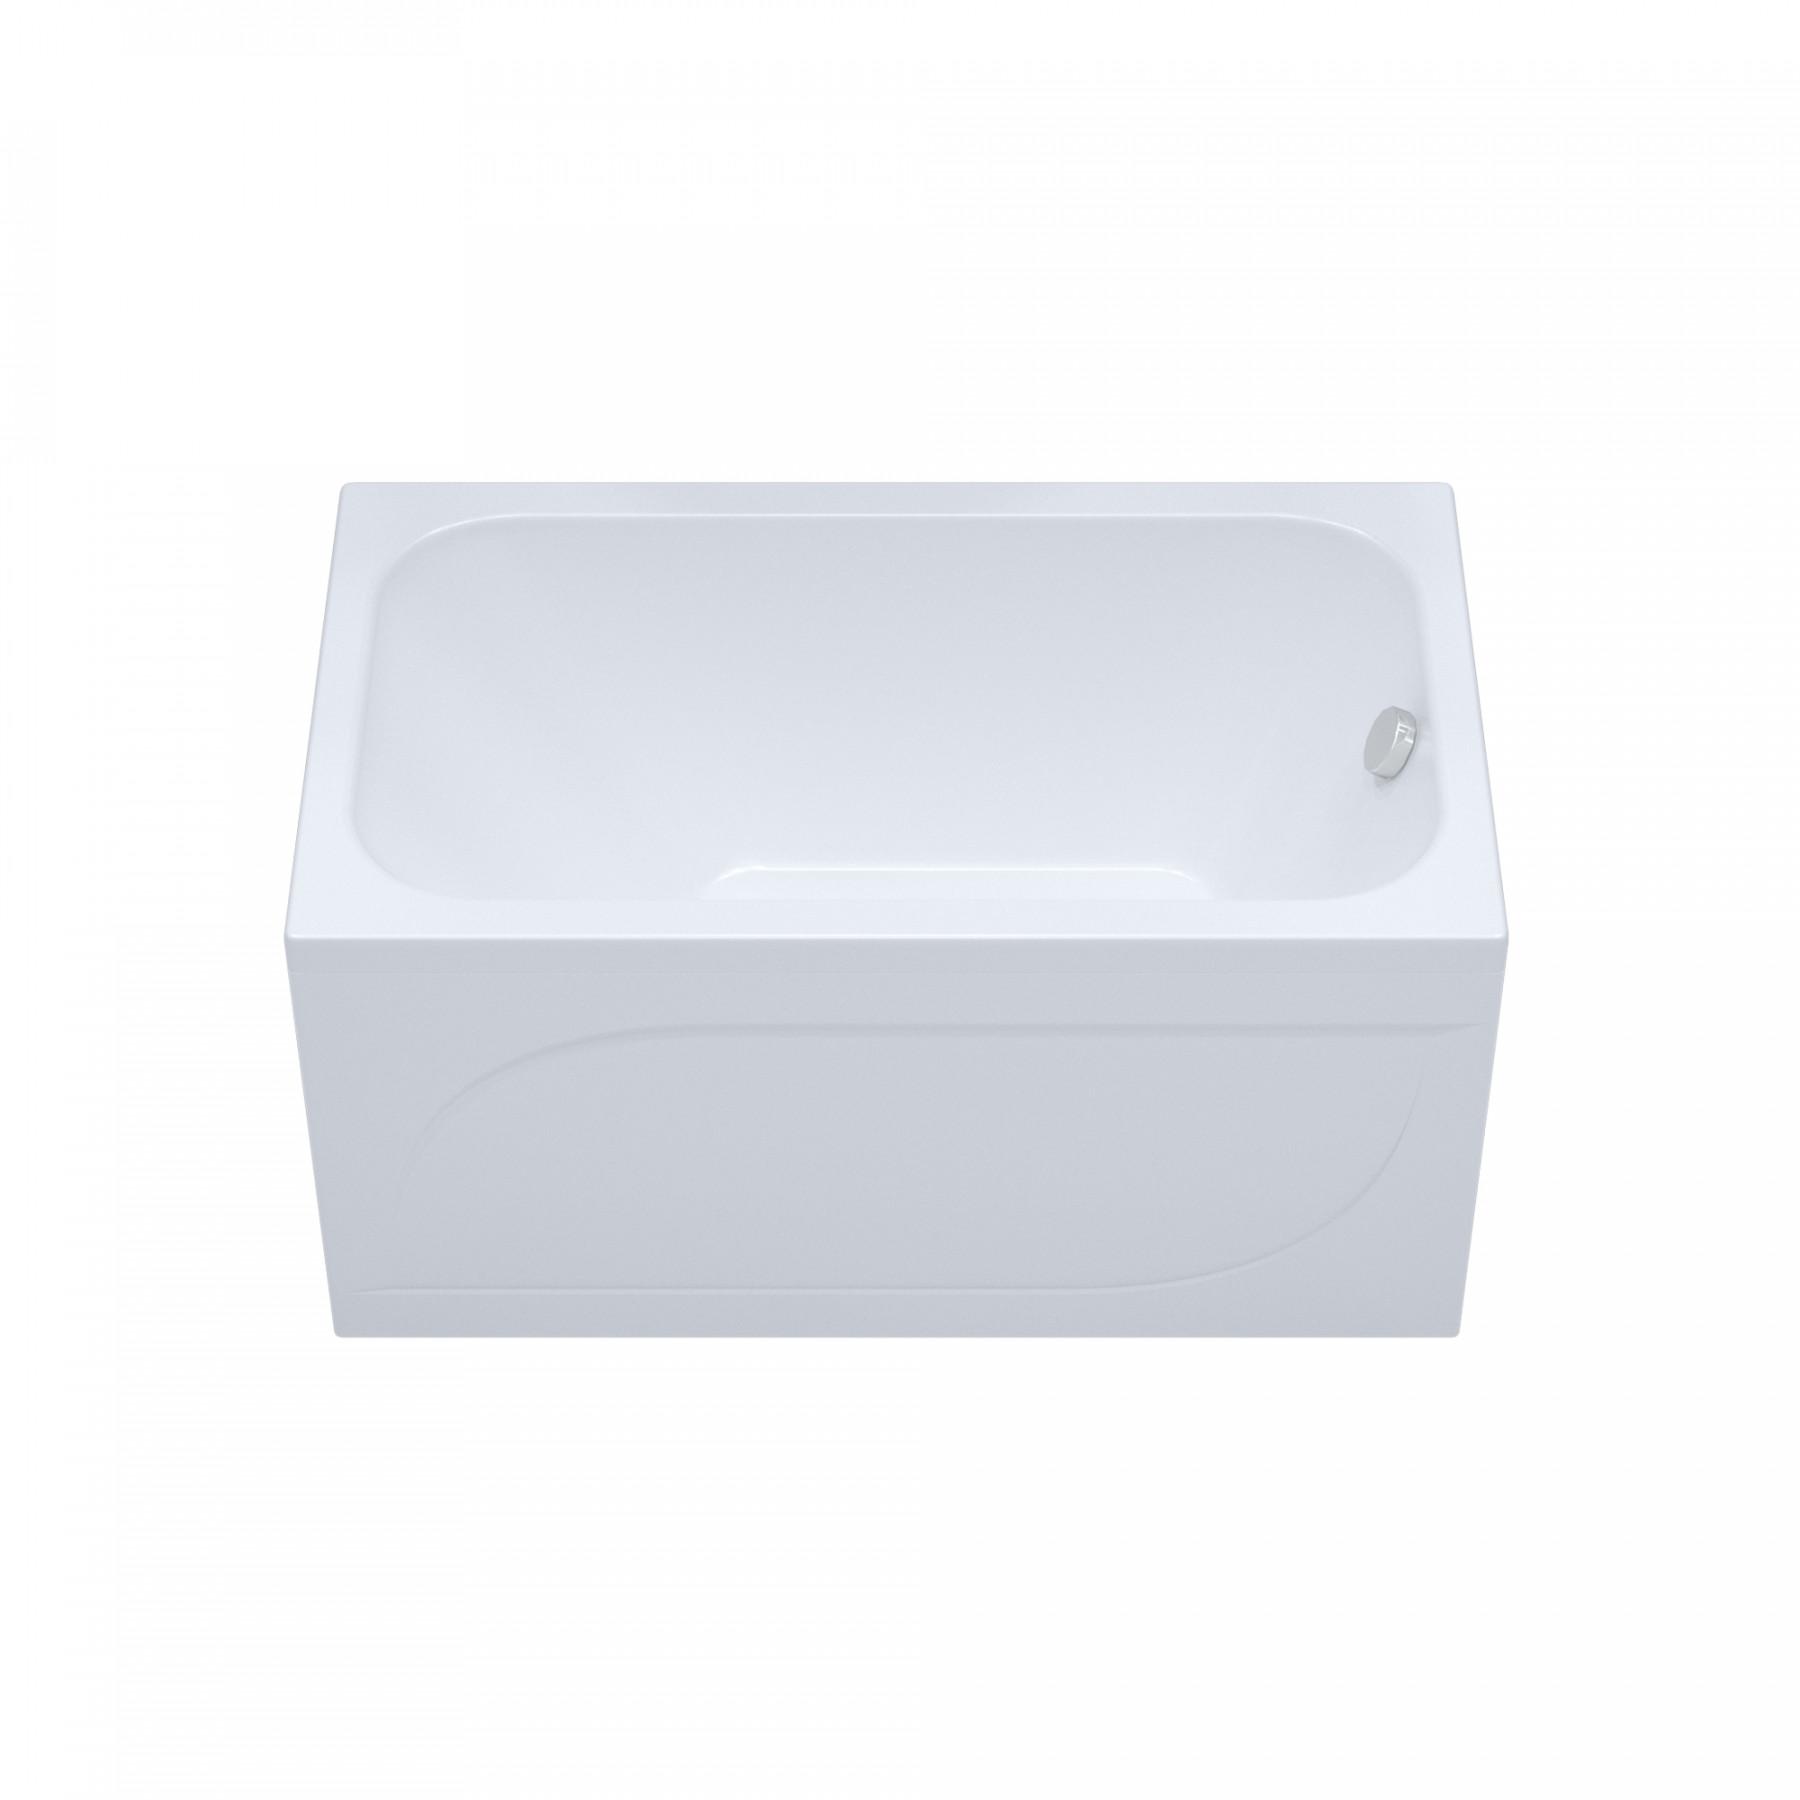 Акриловая ванна Triton Стандарт 120x70